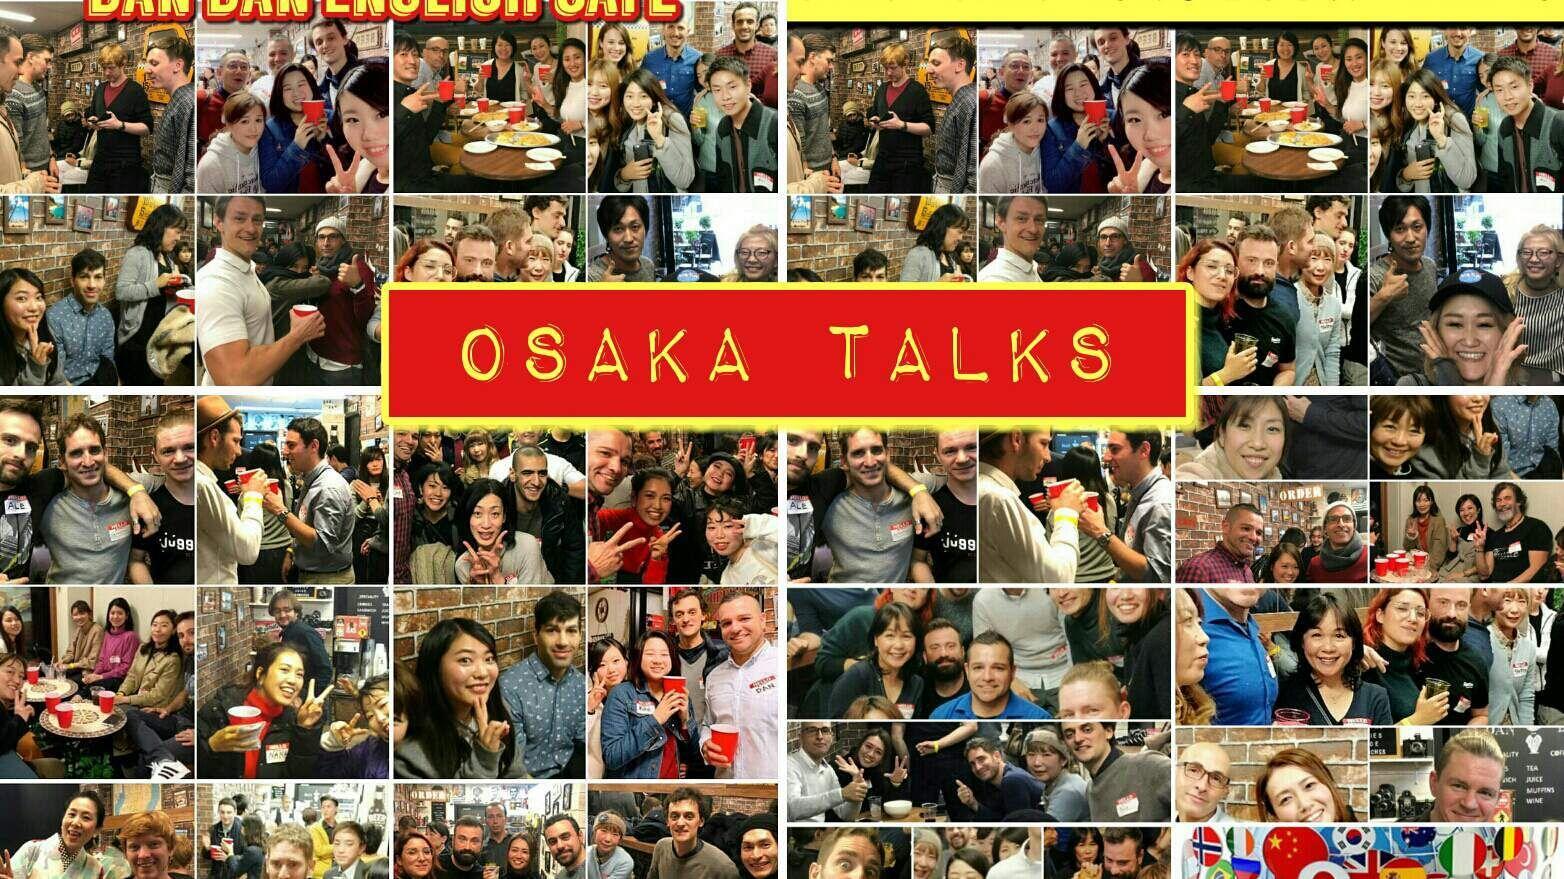 Osaka Talks in Dan Dan English Cafe (International friends)